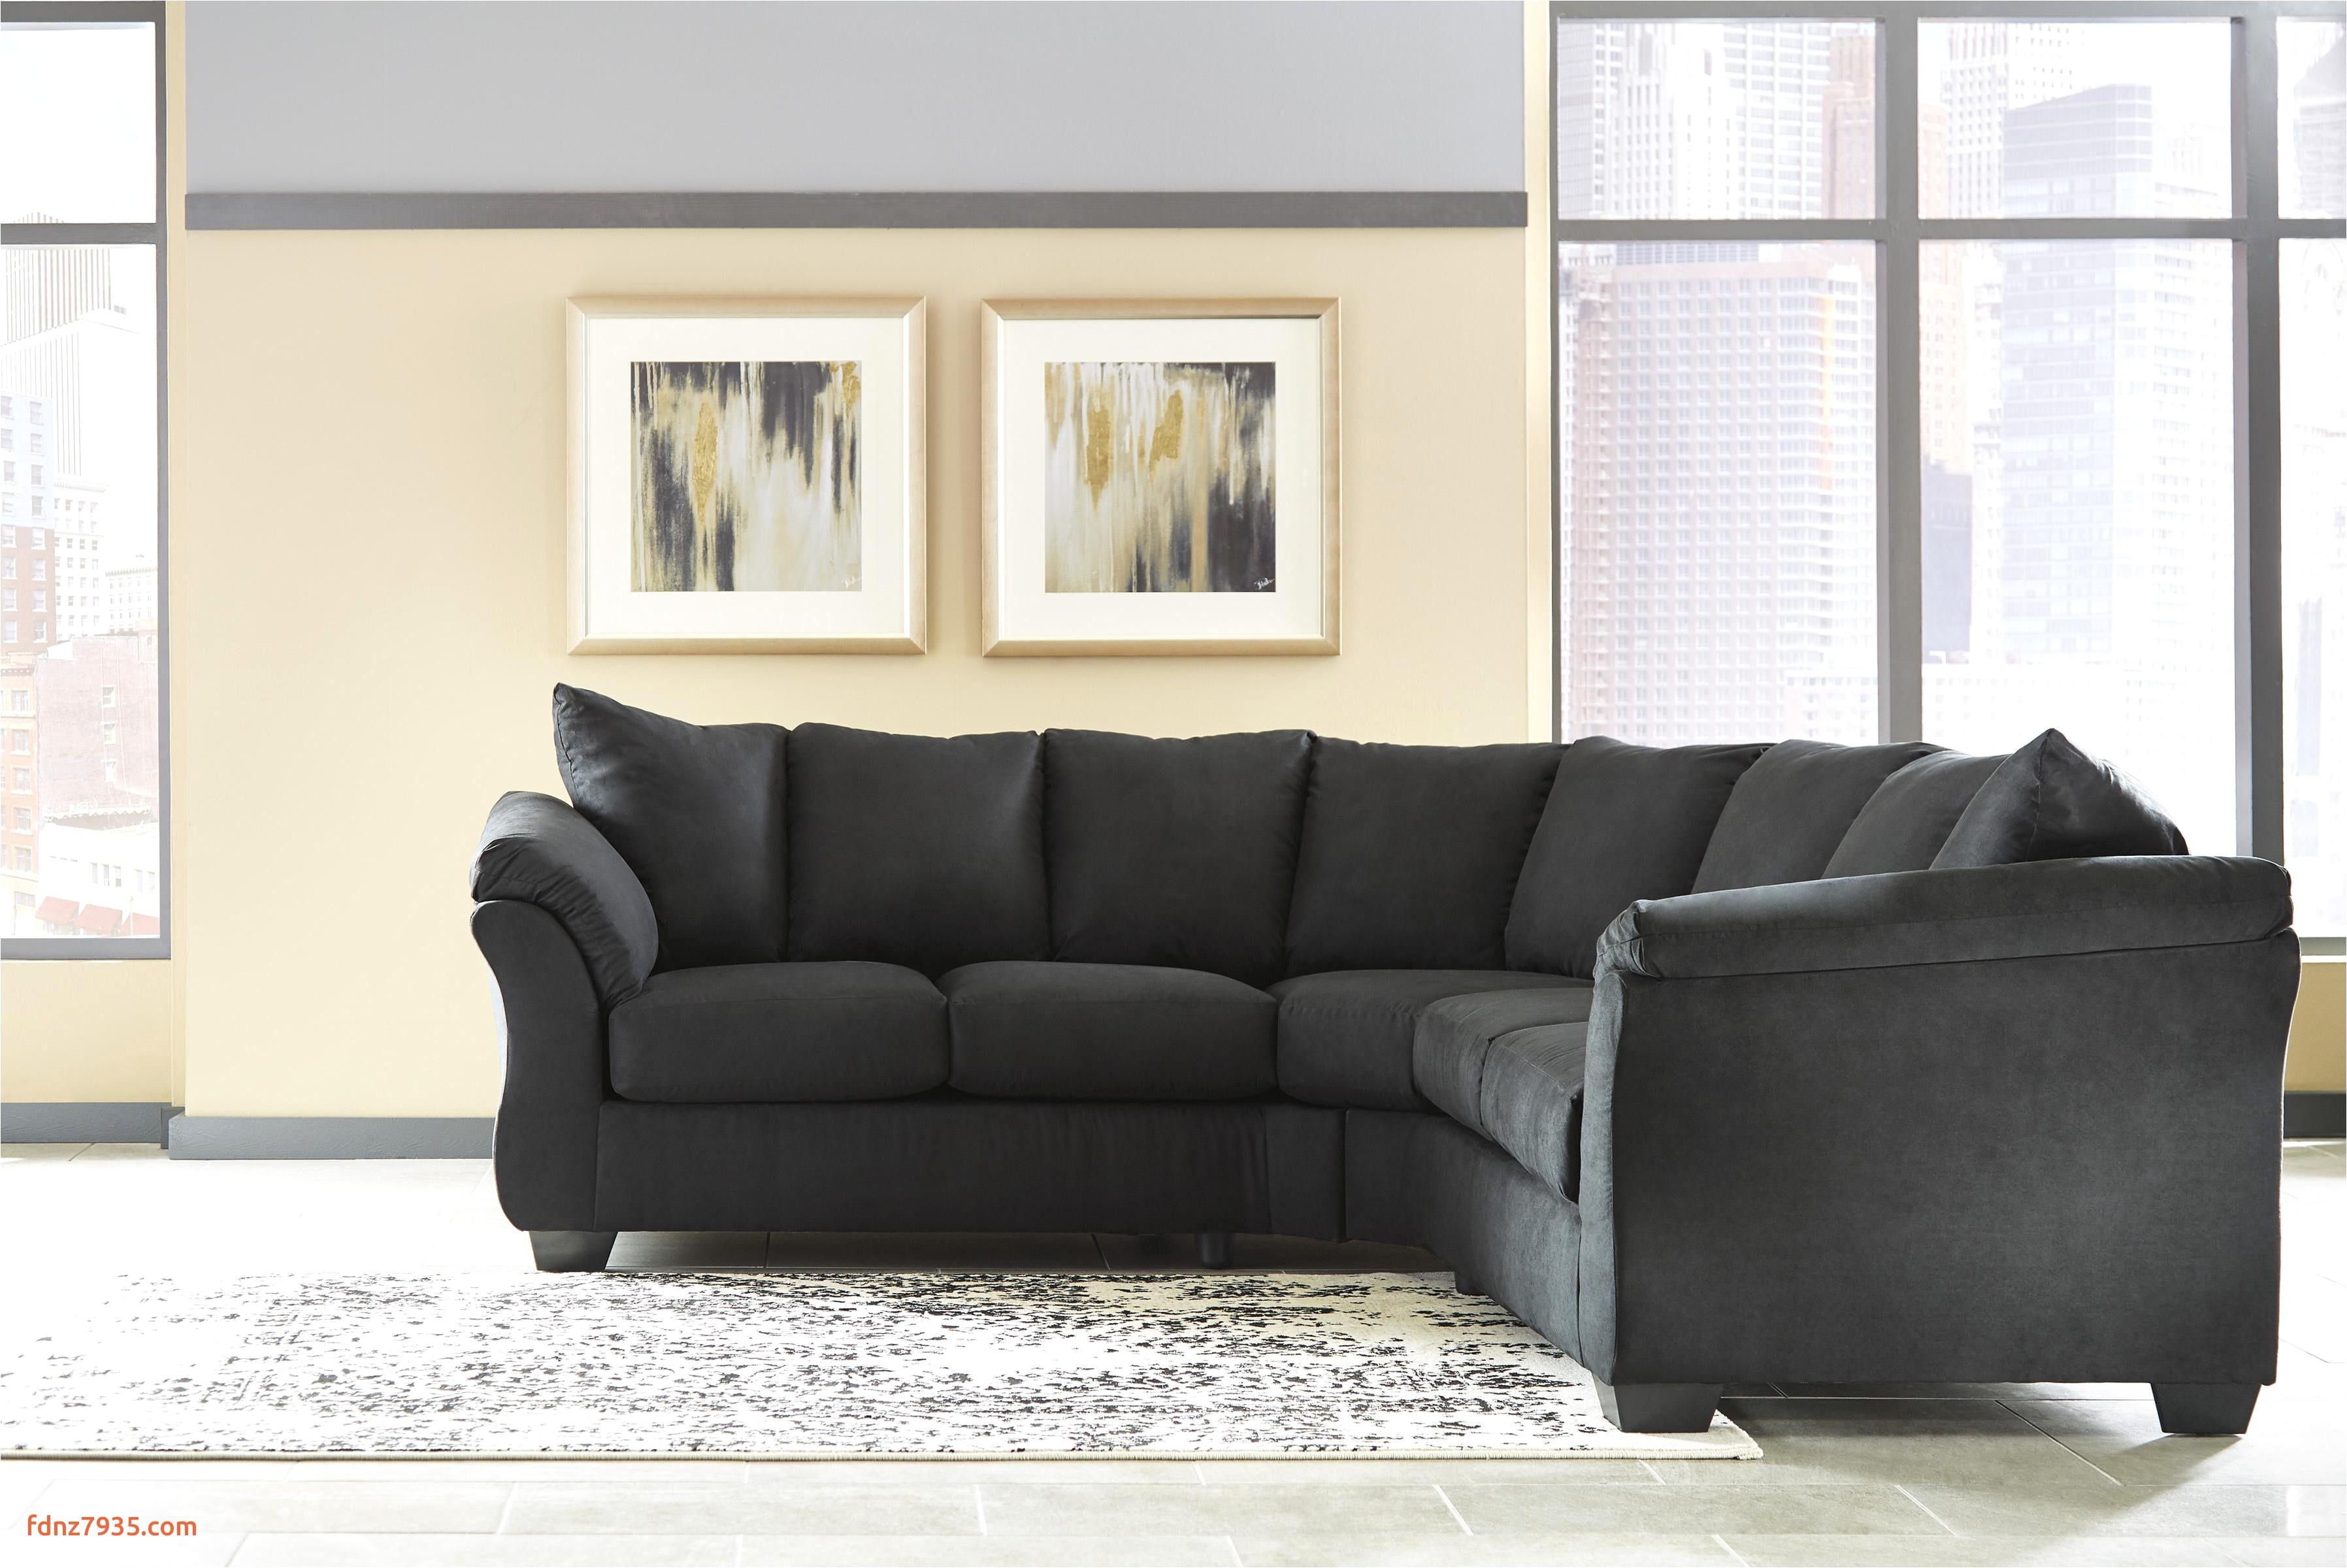 Contemporary Italian Sectional sofa Italian Sectional sofa Fresh sofa Design